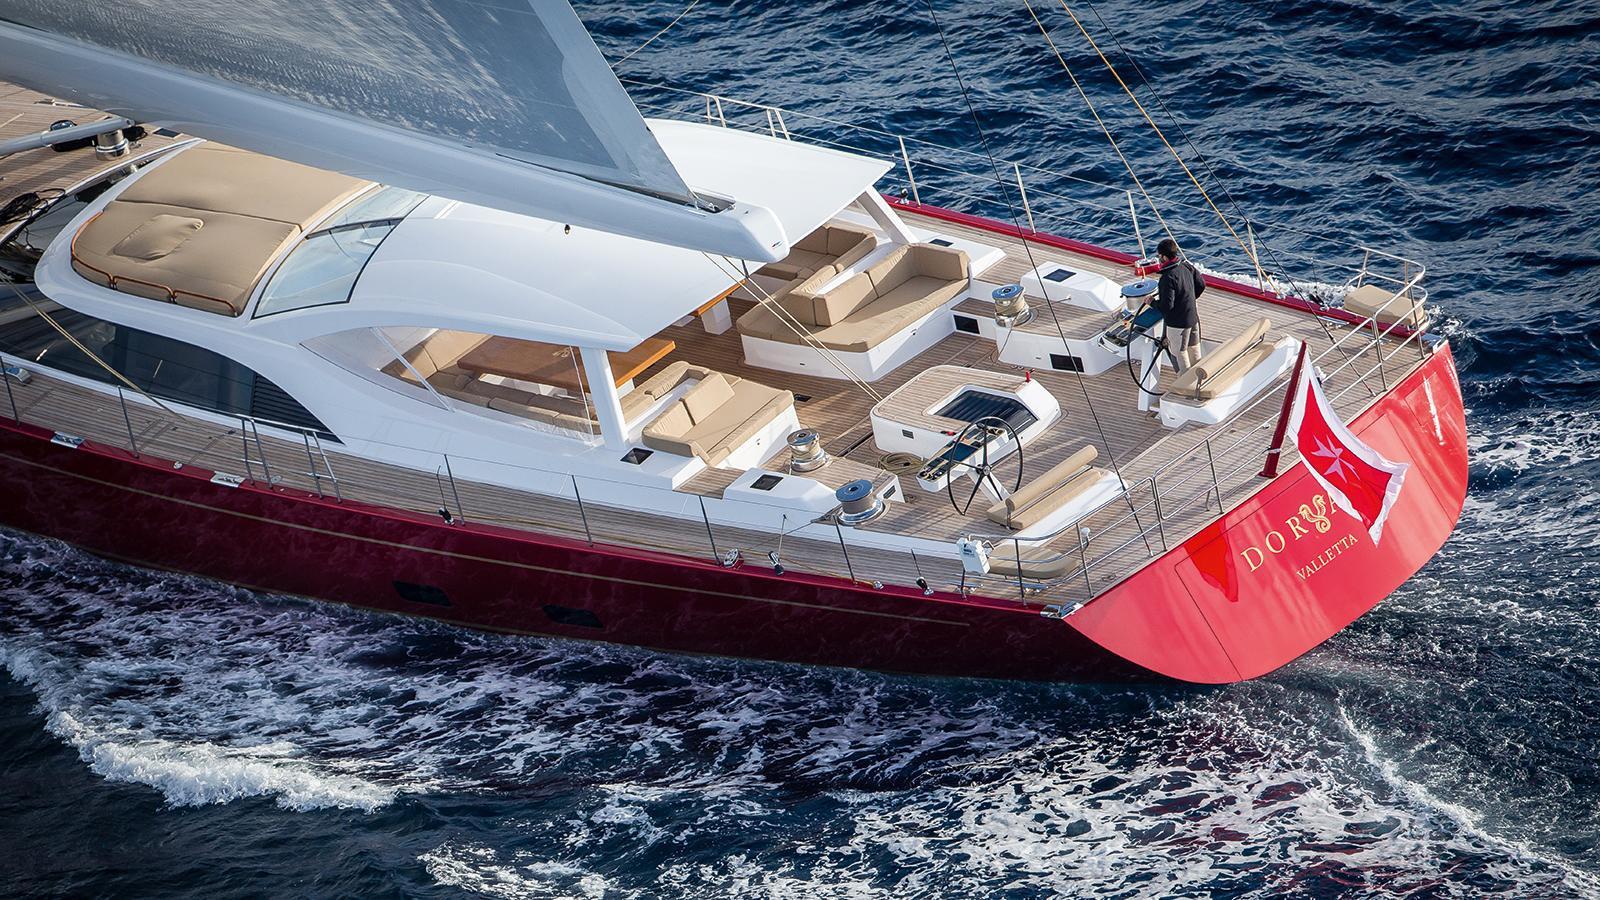 doryan-sailing-yacht-2015-35m-stern-cruising